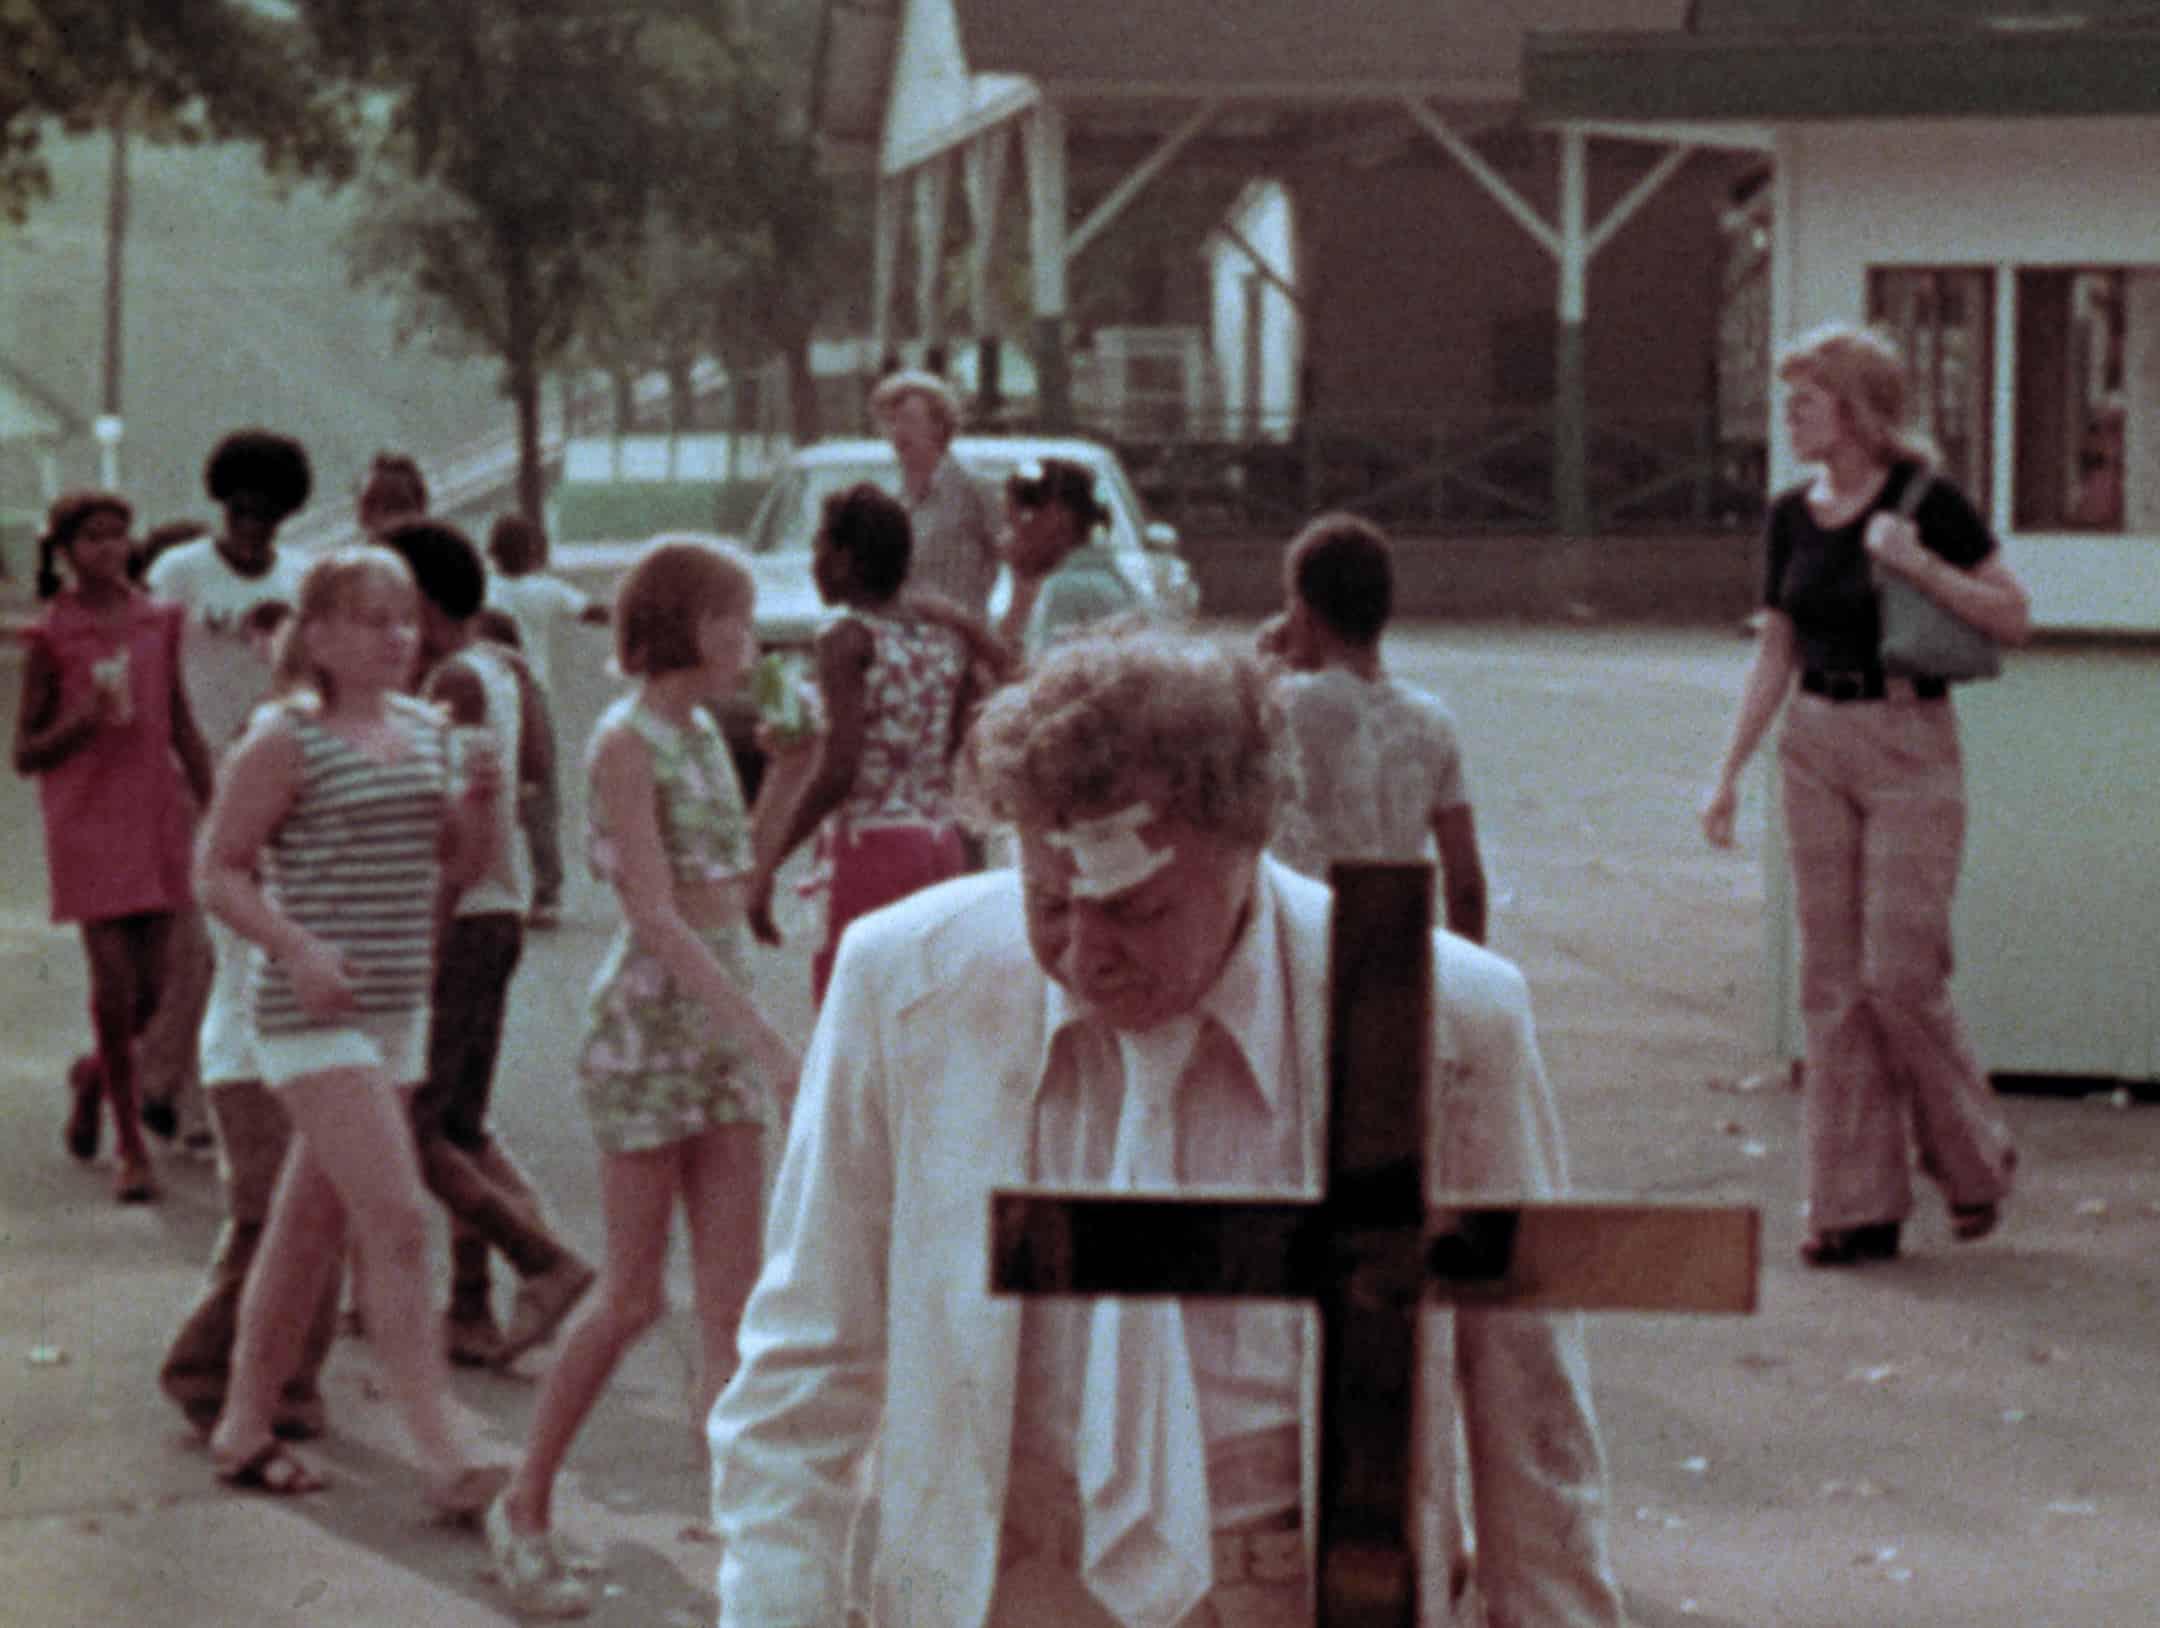 George Romero's lost film The Amusement Park returns via Shudder (2021) 4